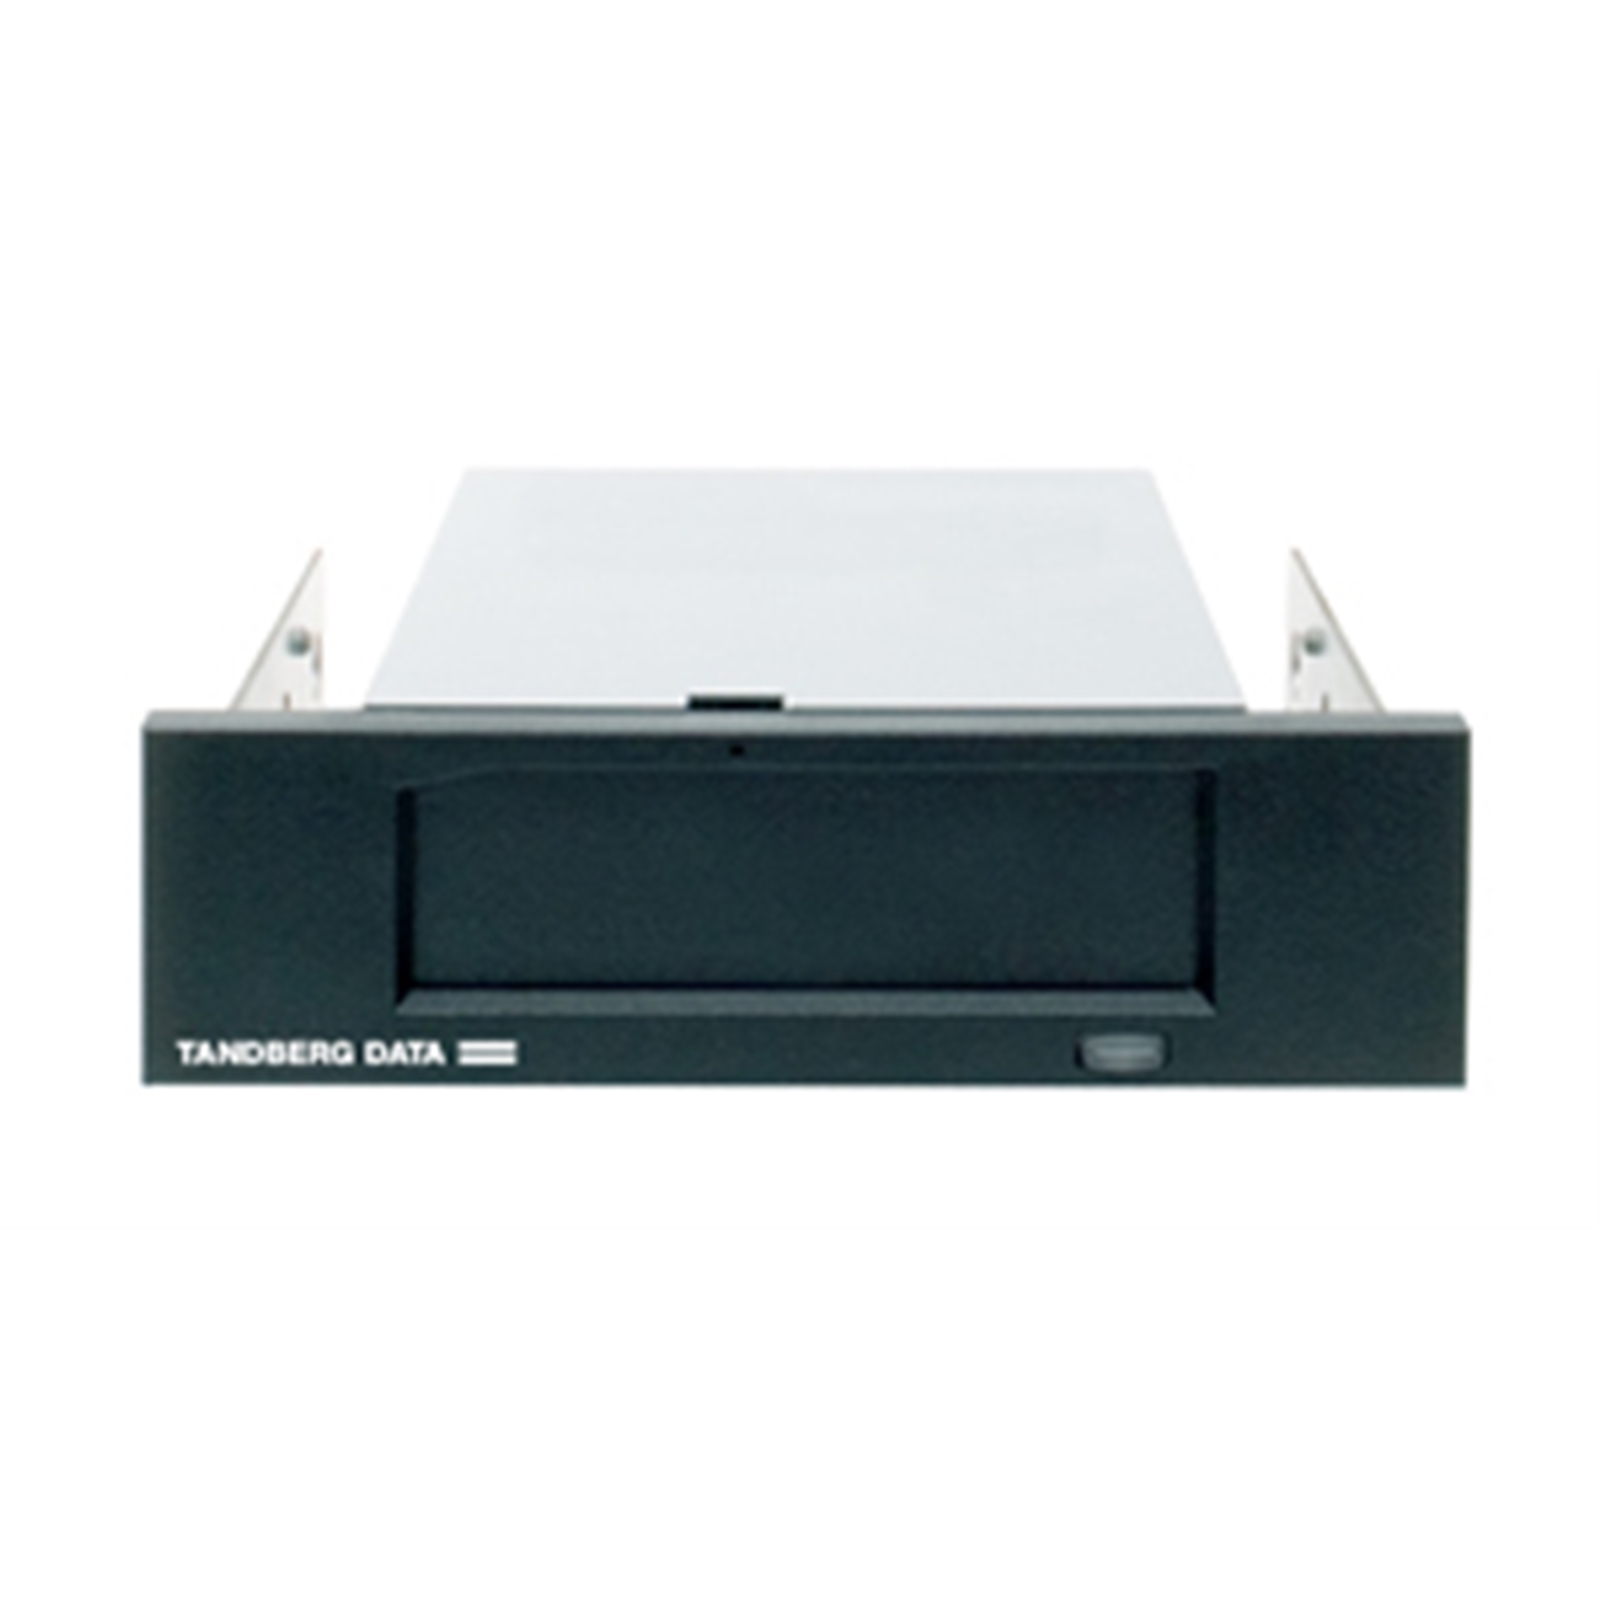 Tandberg Rdx 8636 Rdx Servers Plus